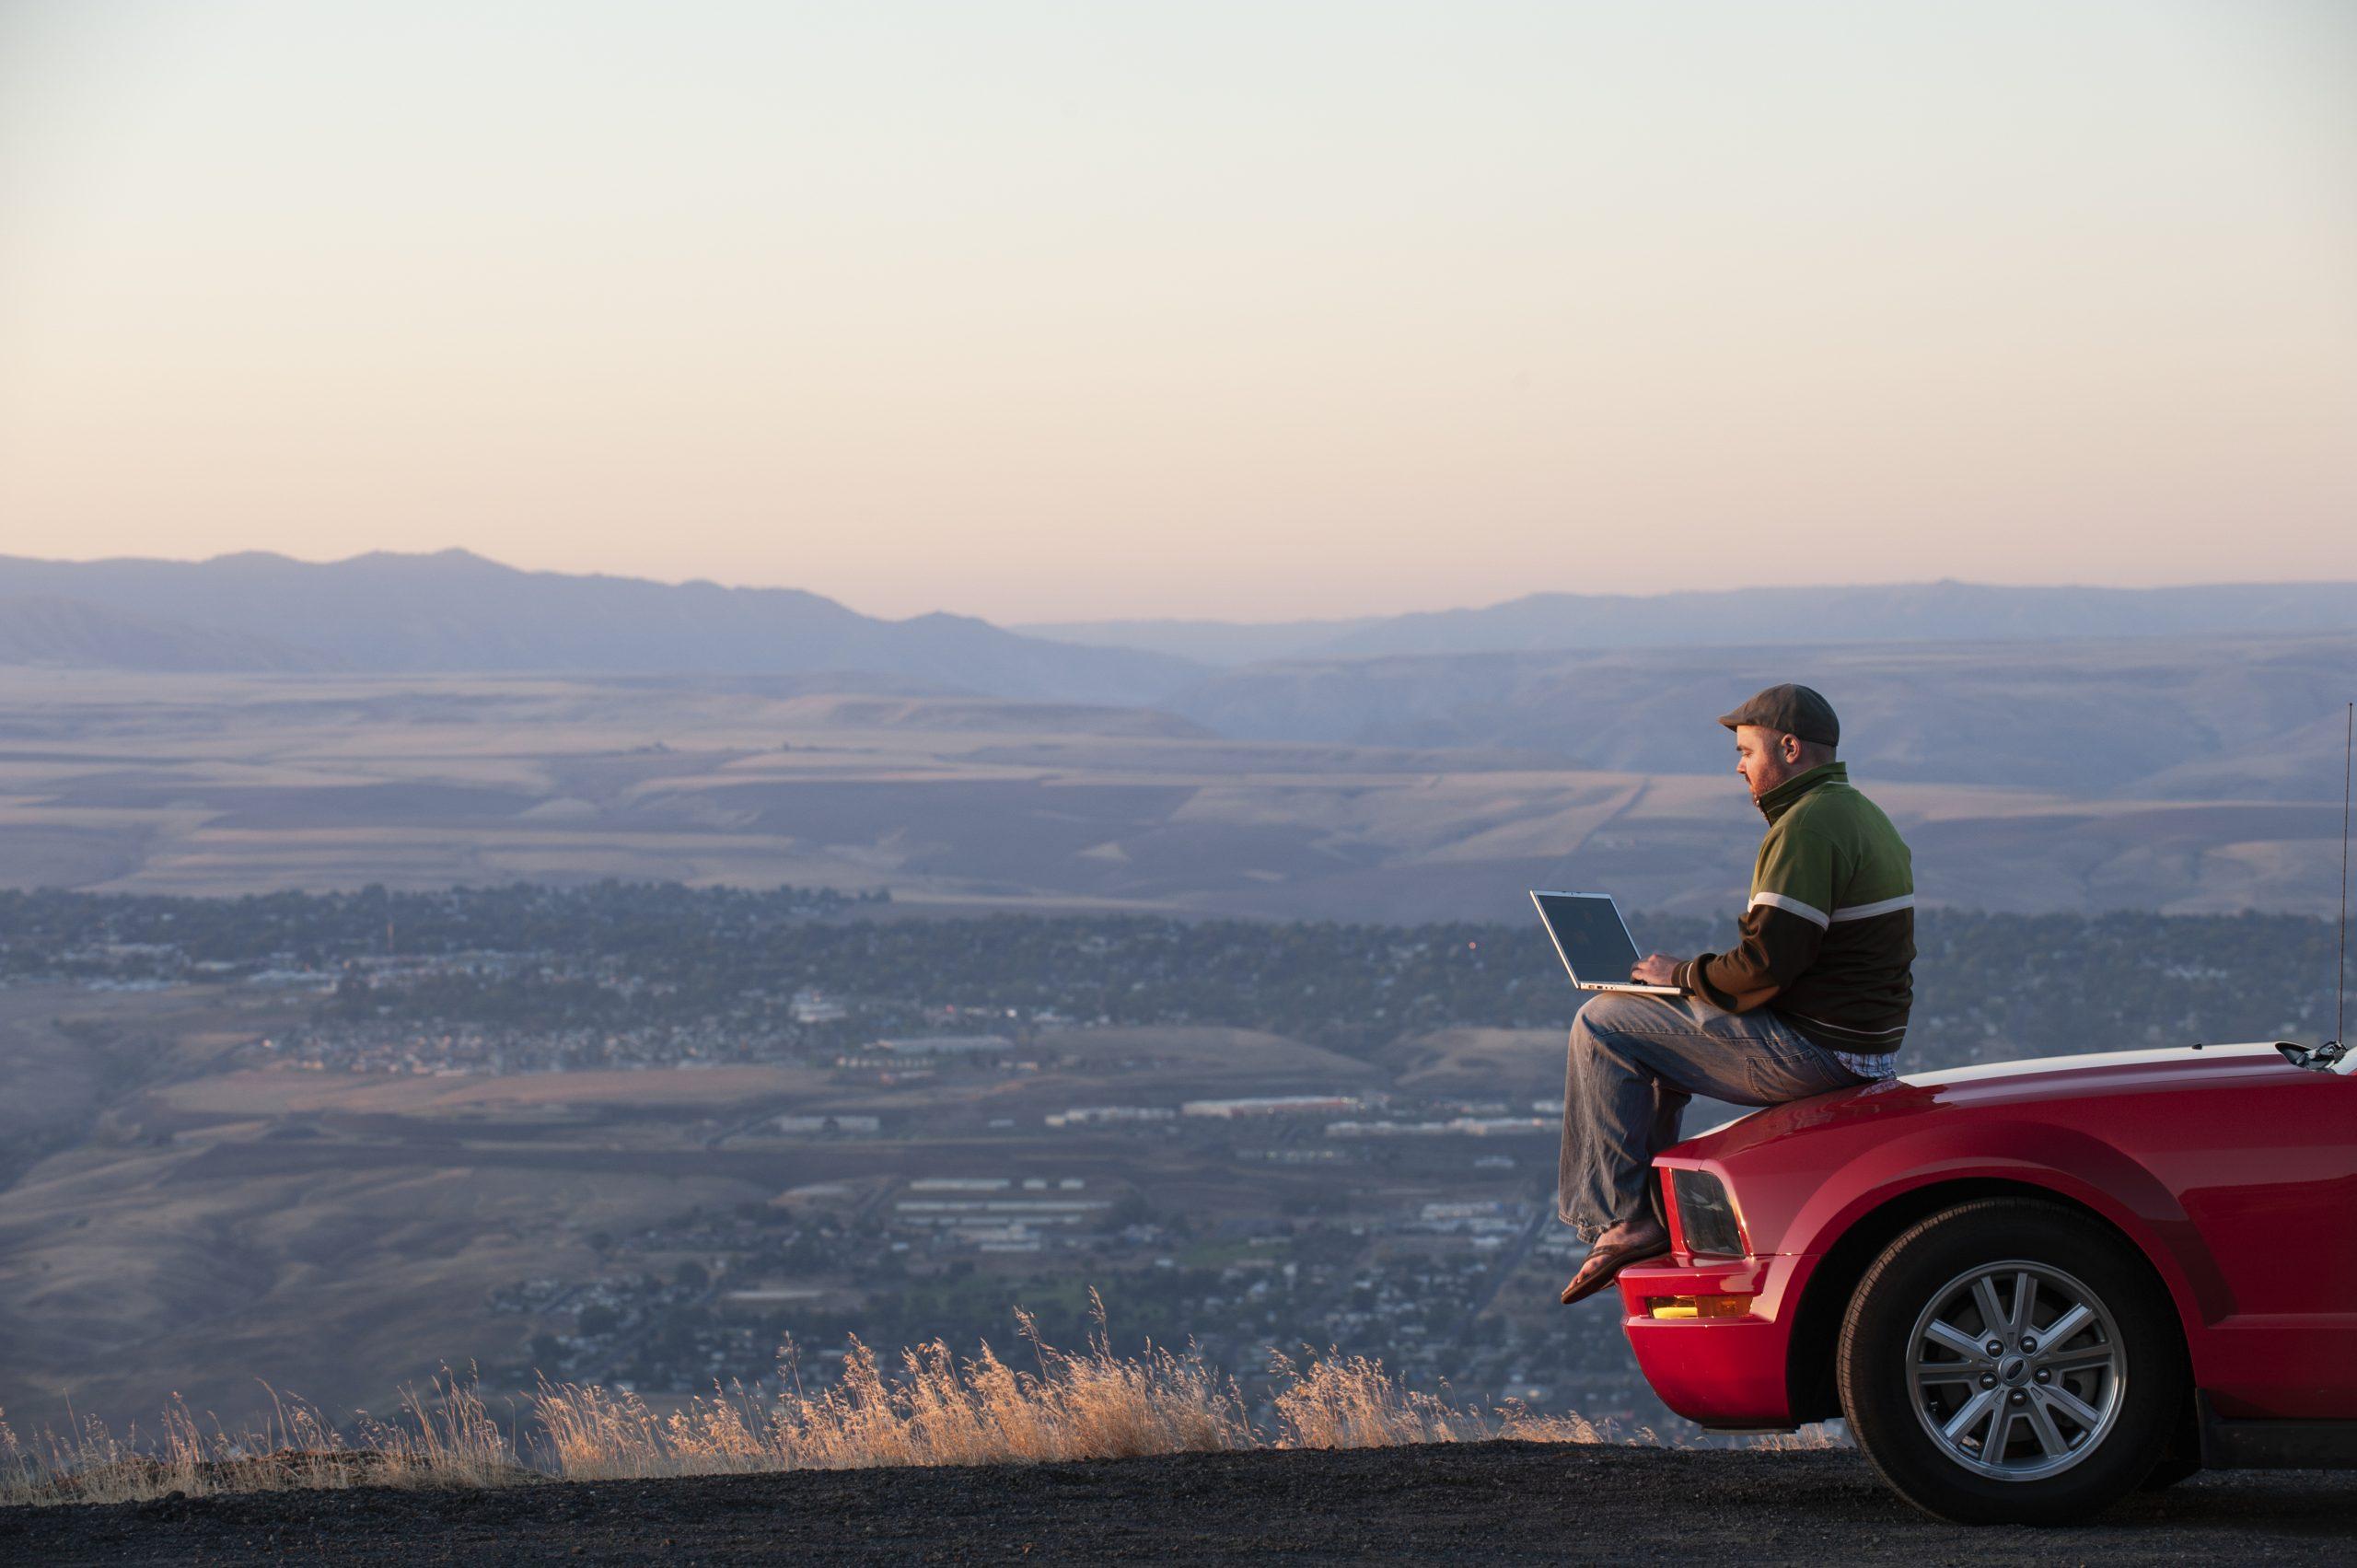 Idaho Conditional Use Permit